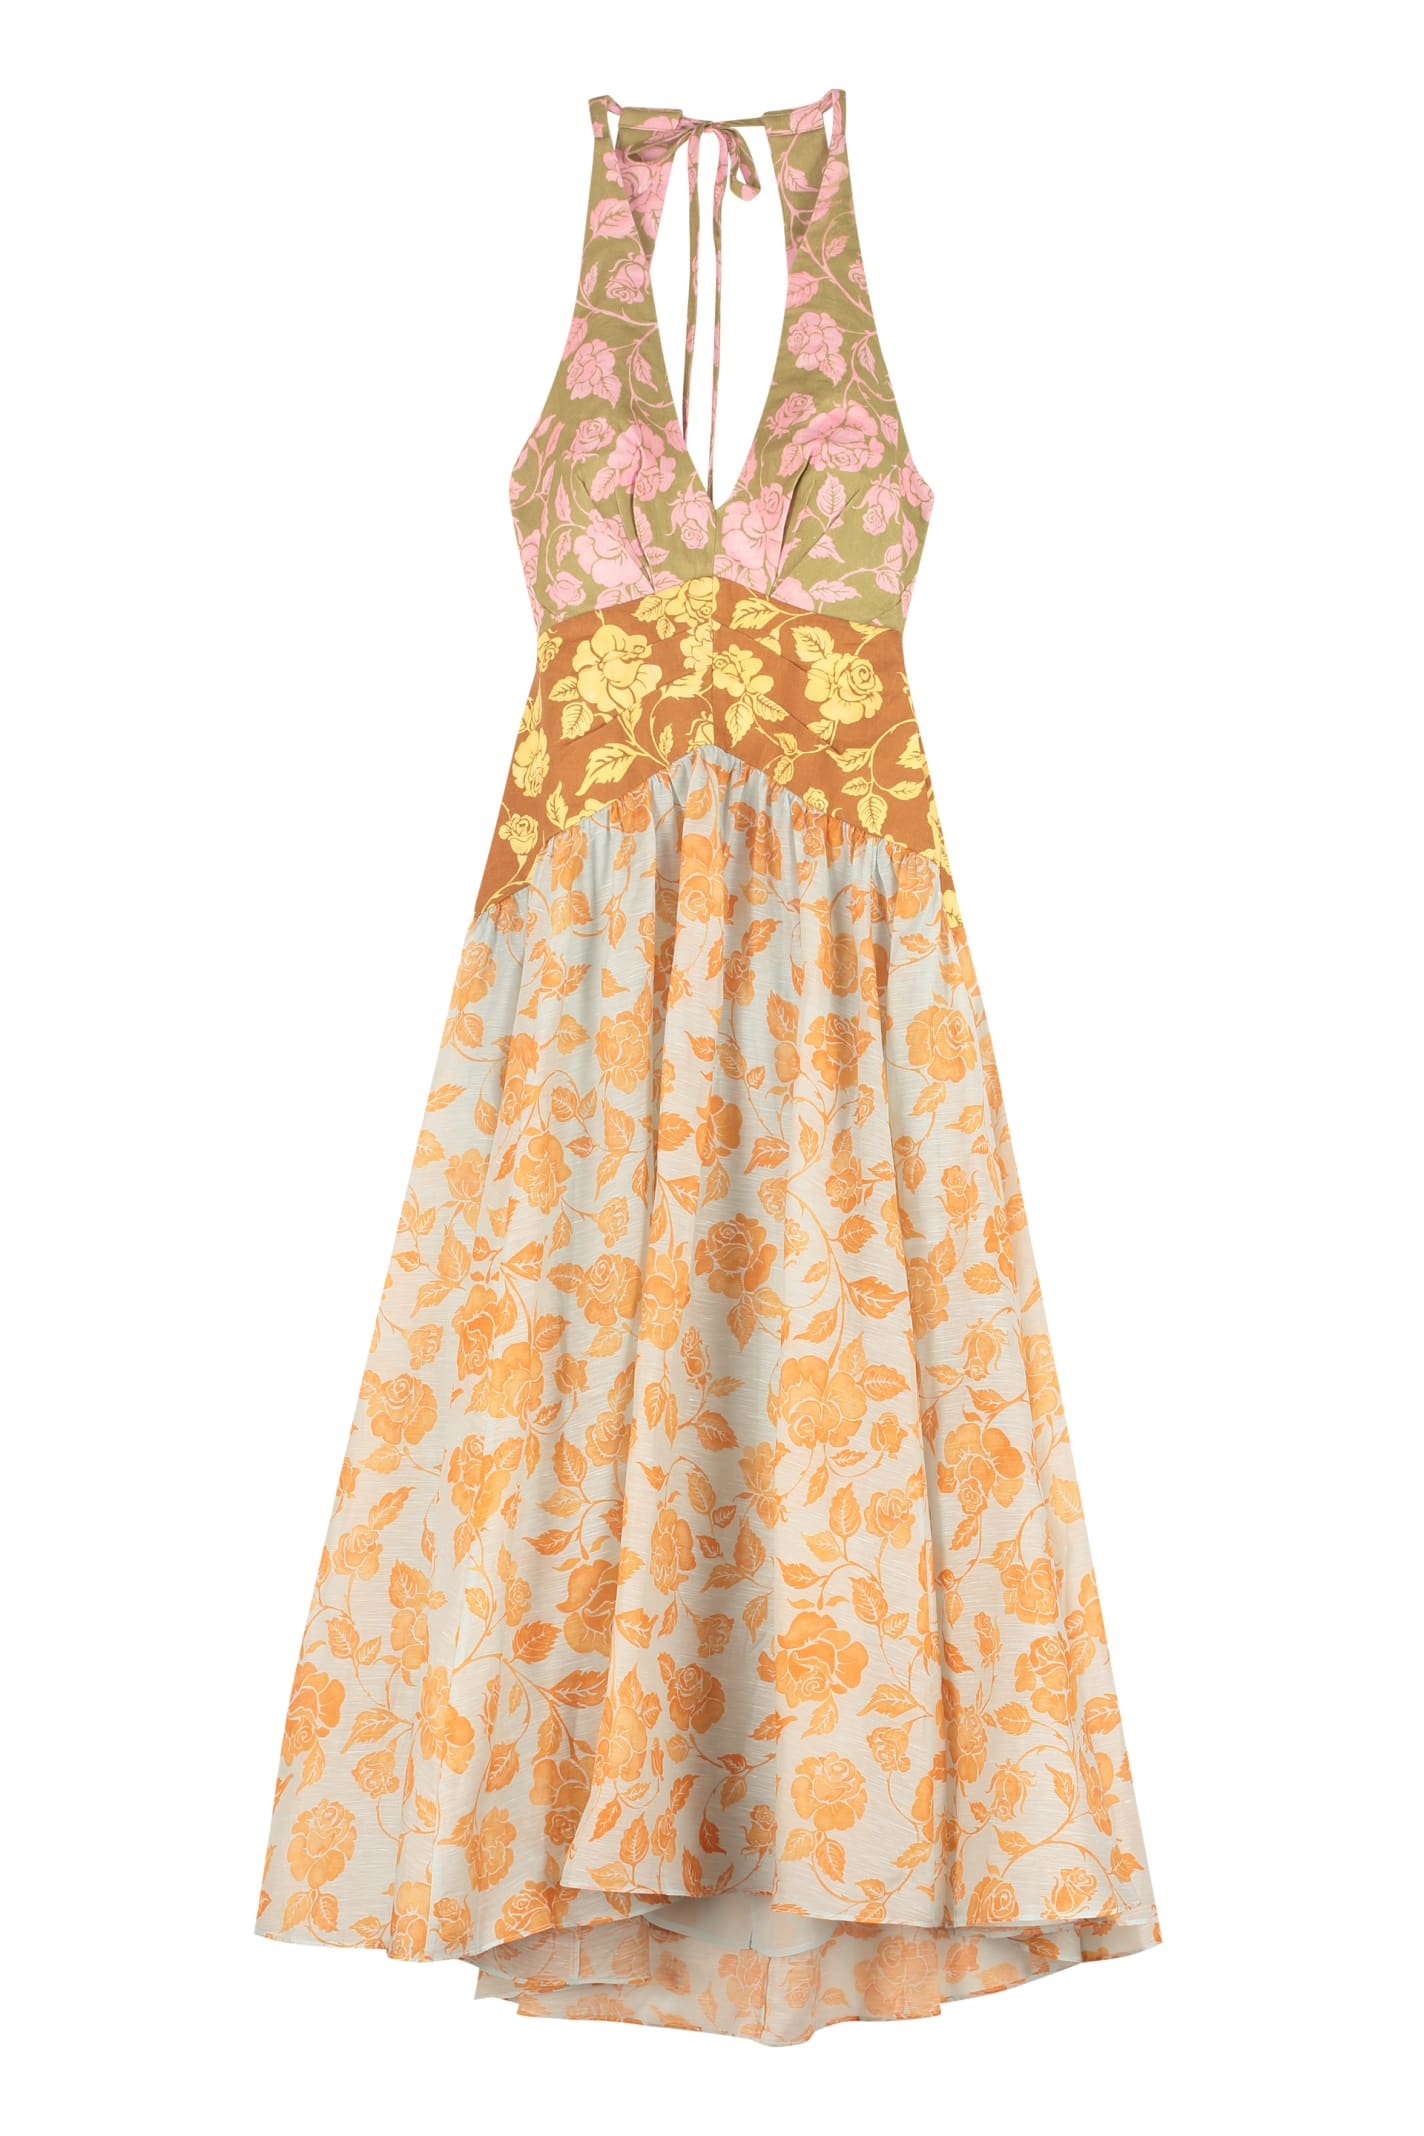 Zimmermann The Lovestruck Printed Linen Dress